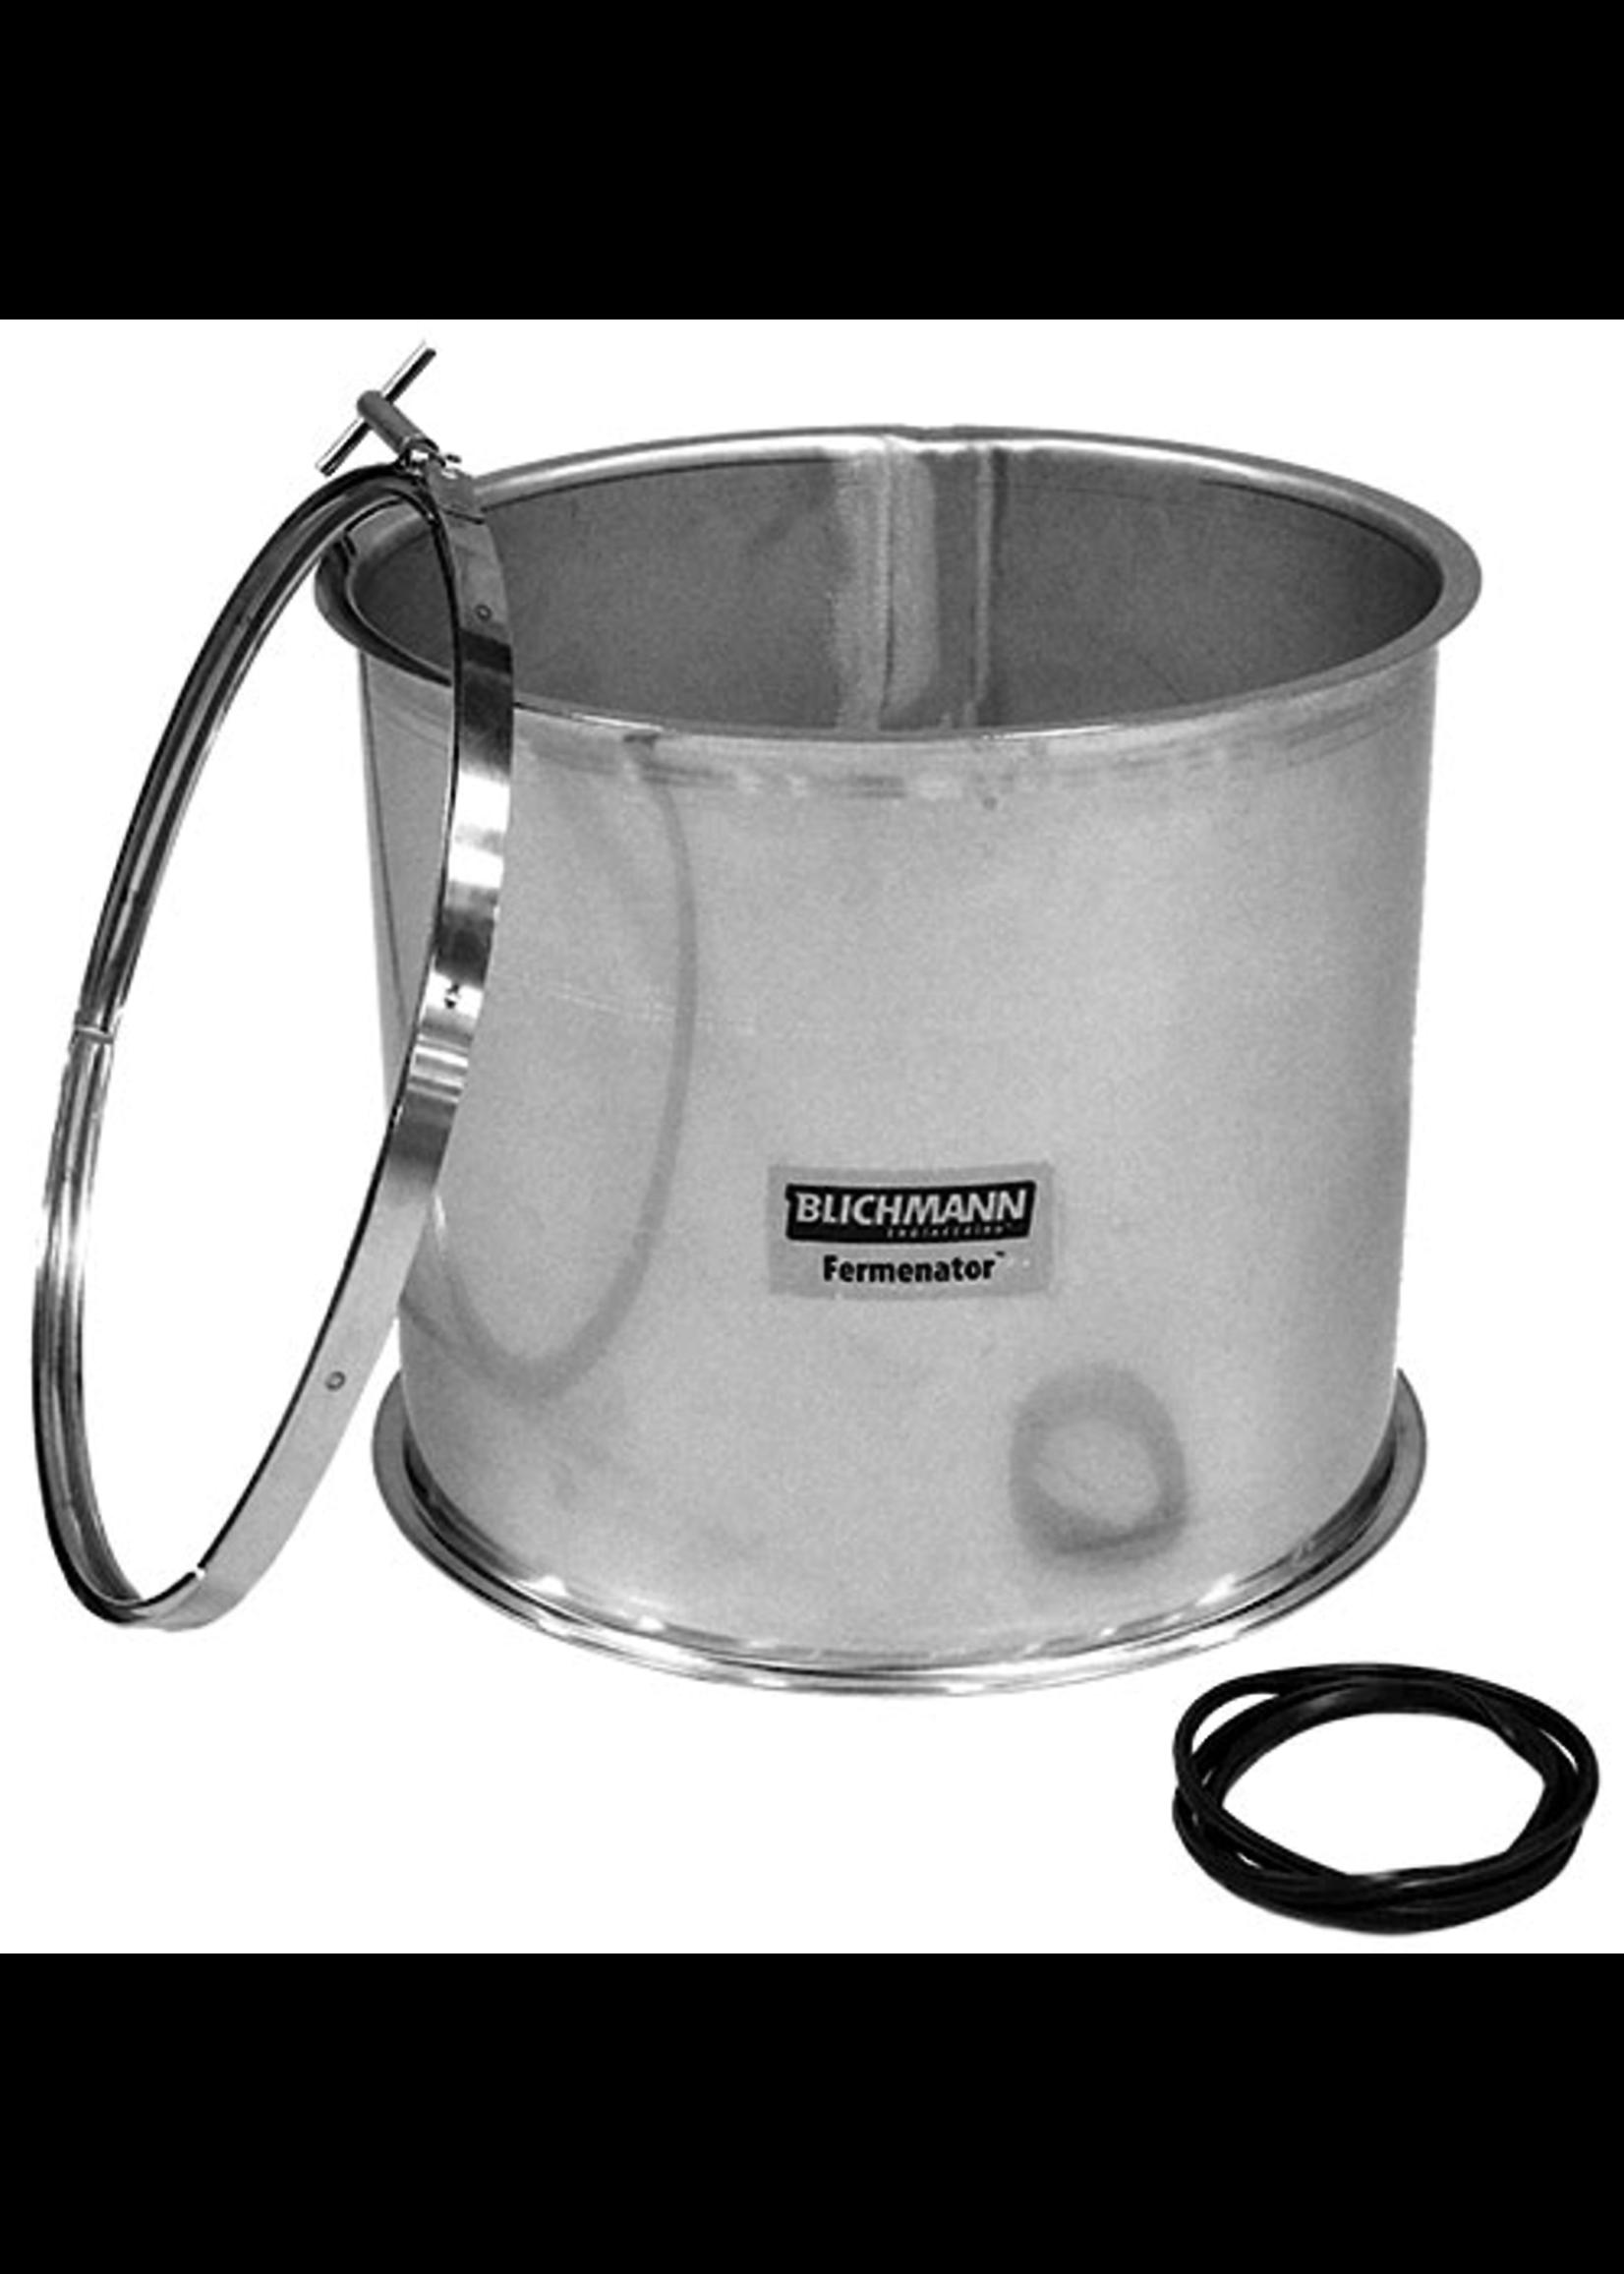 Blichmann Blichmann Fermenator - Capacity Extension for 27/42 Gallon Conicals (63/80 Gallon Gross)